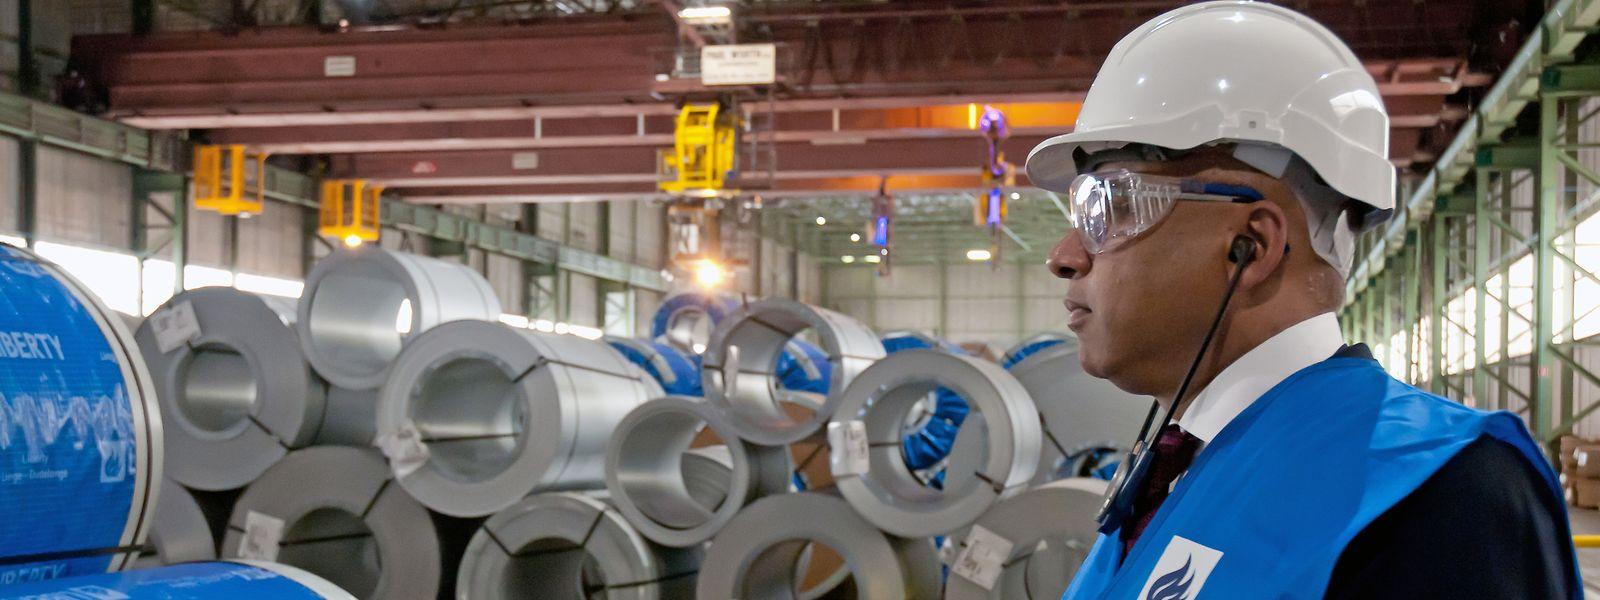 Einweihung Liberty Steel Düdelingen in der Z.I. Wolser. Sanjeev Gupta (Executive Chairman)